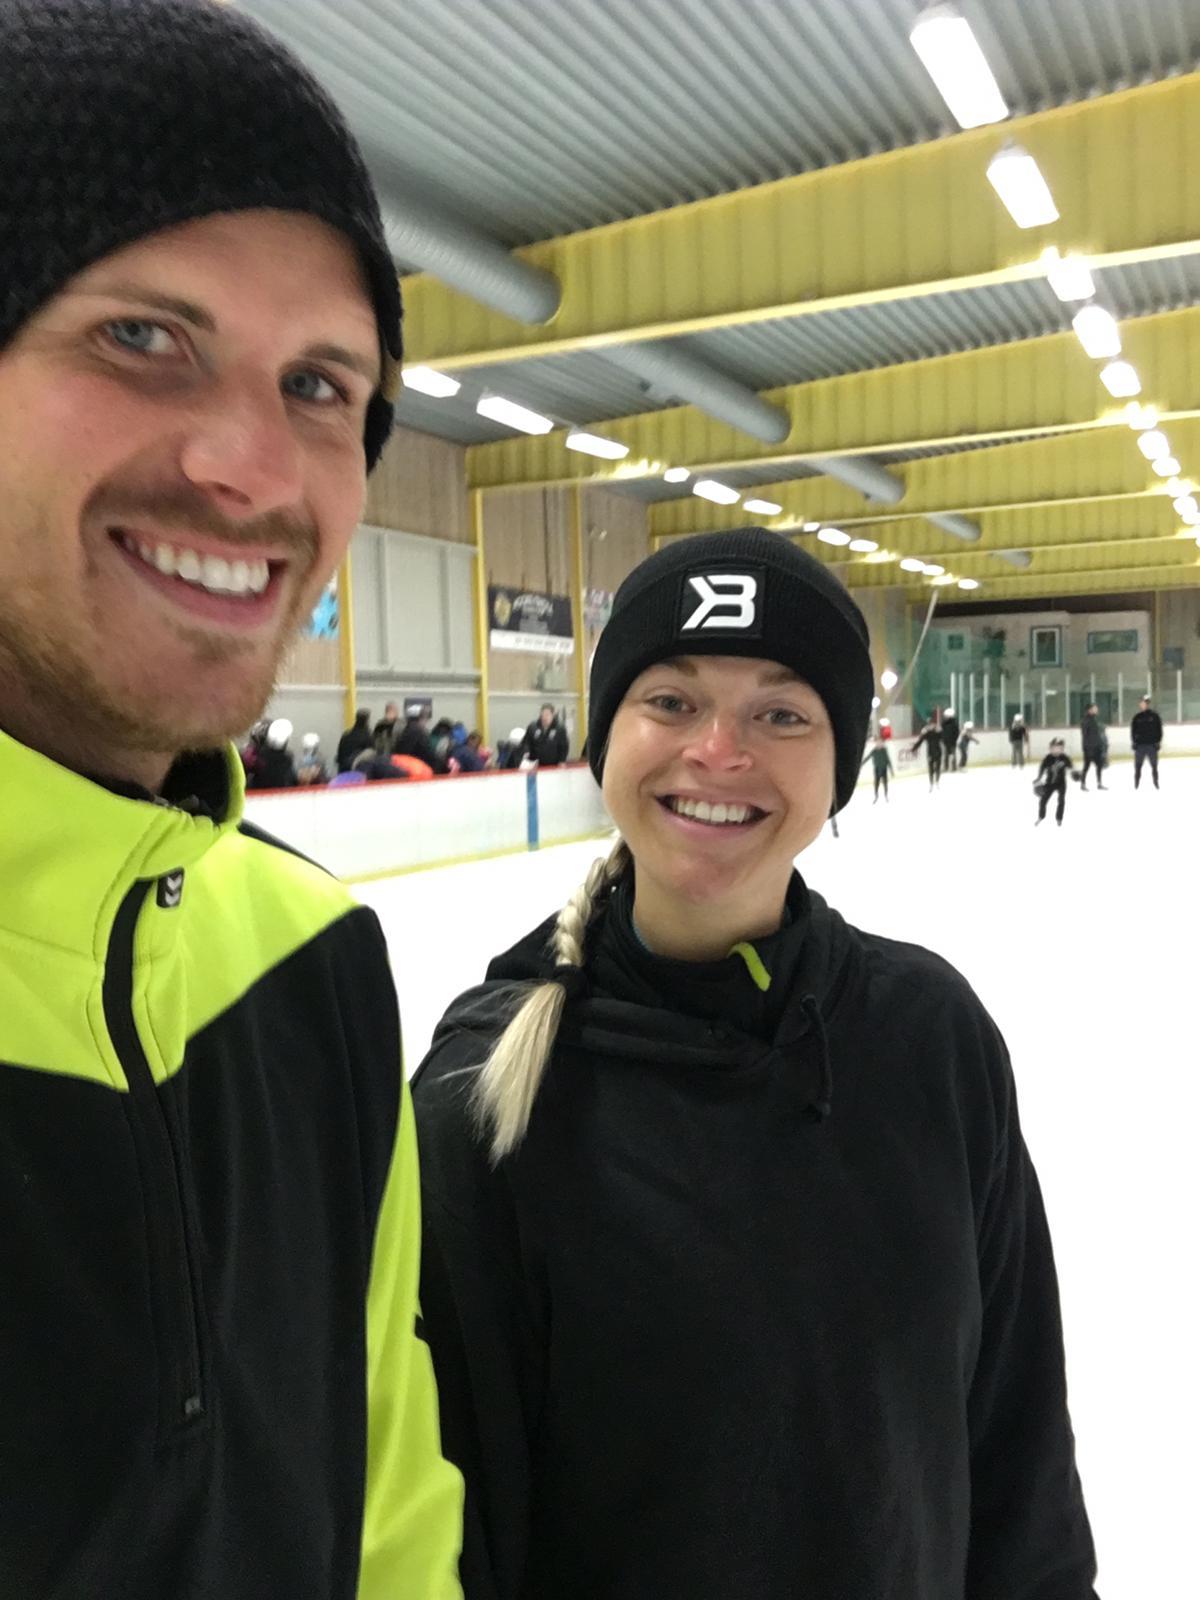 Linn Stenholm fitness ice skating